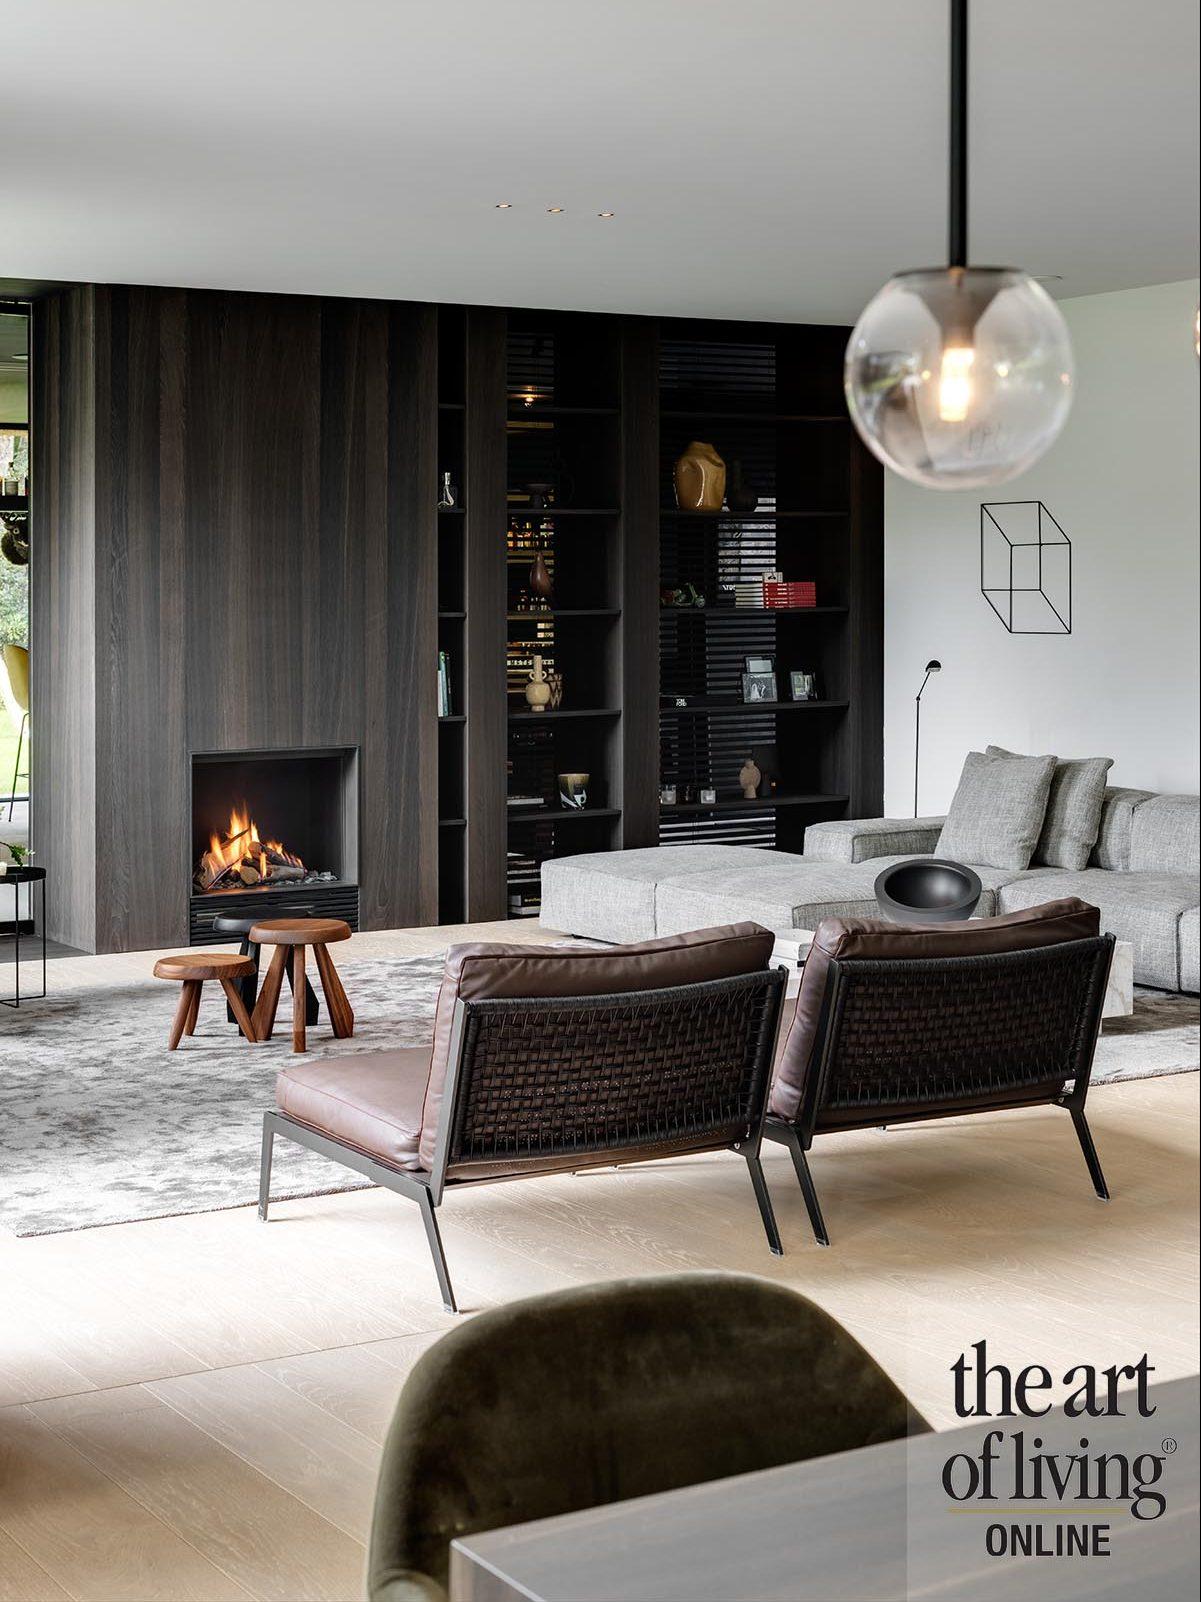 Droomvilla | Niels Maier, the art of living